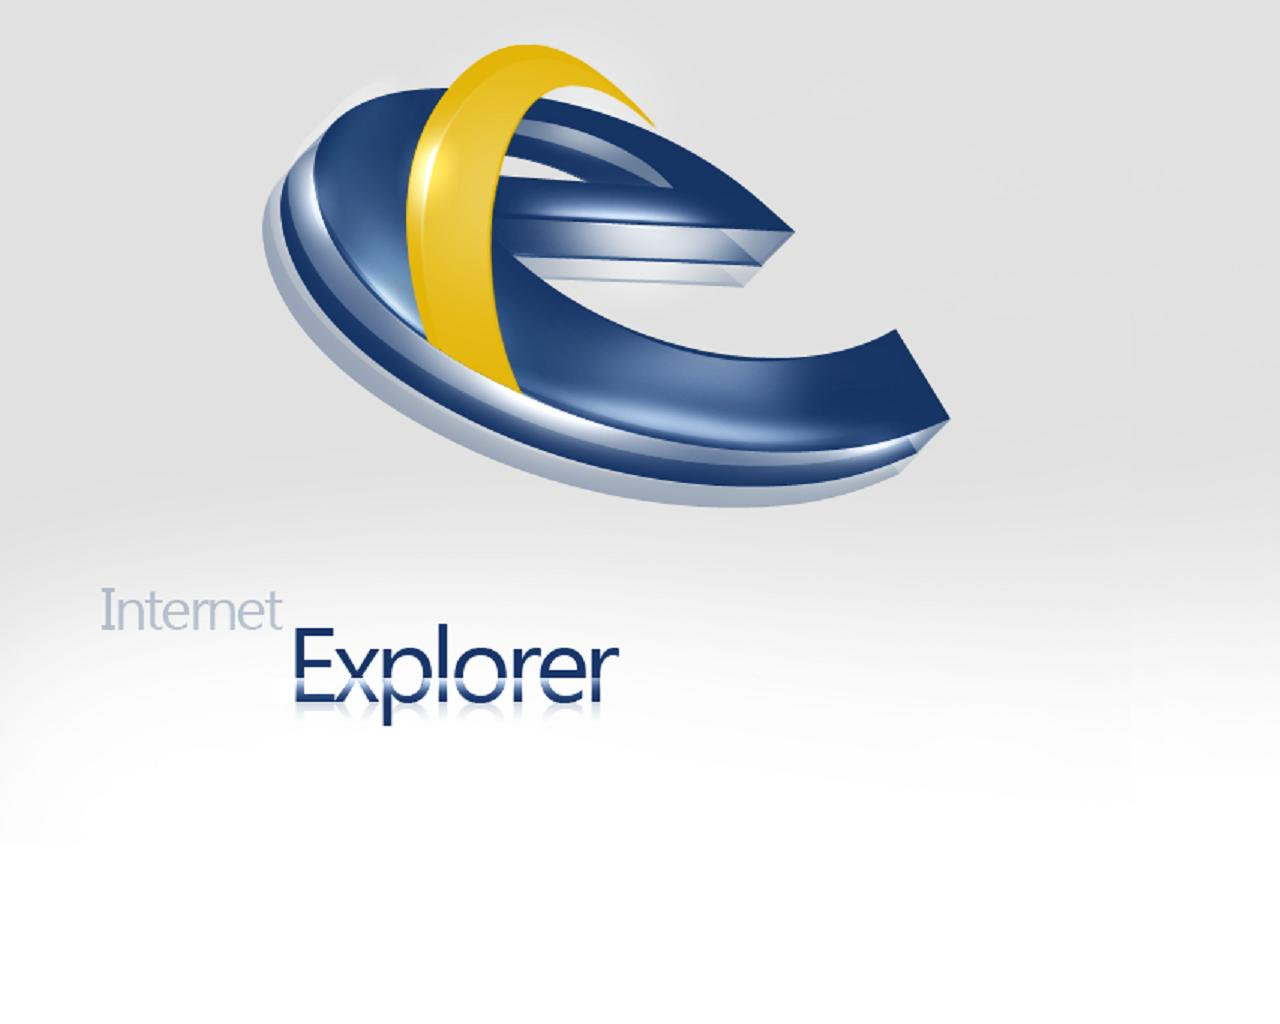 http://4.bp.blogspot.com/-6BjT5UAbLuI/TjBc_hleKTI/AAAAAAAAARw/M5ugCKL9jvA/s1600/internet_explorer.jpg